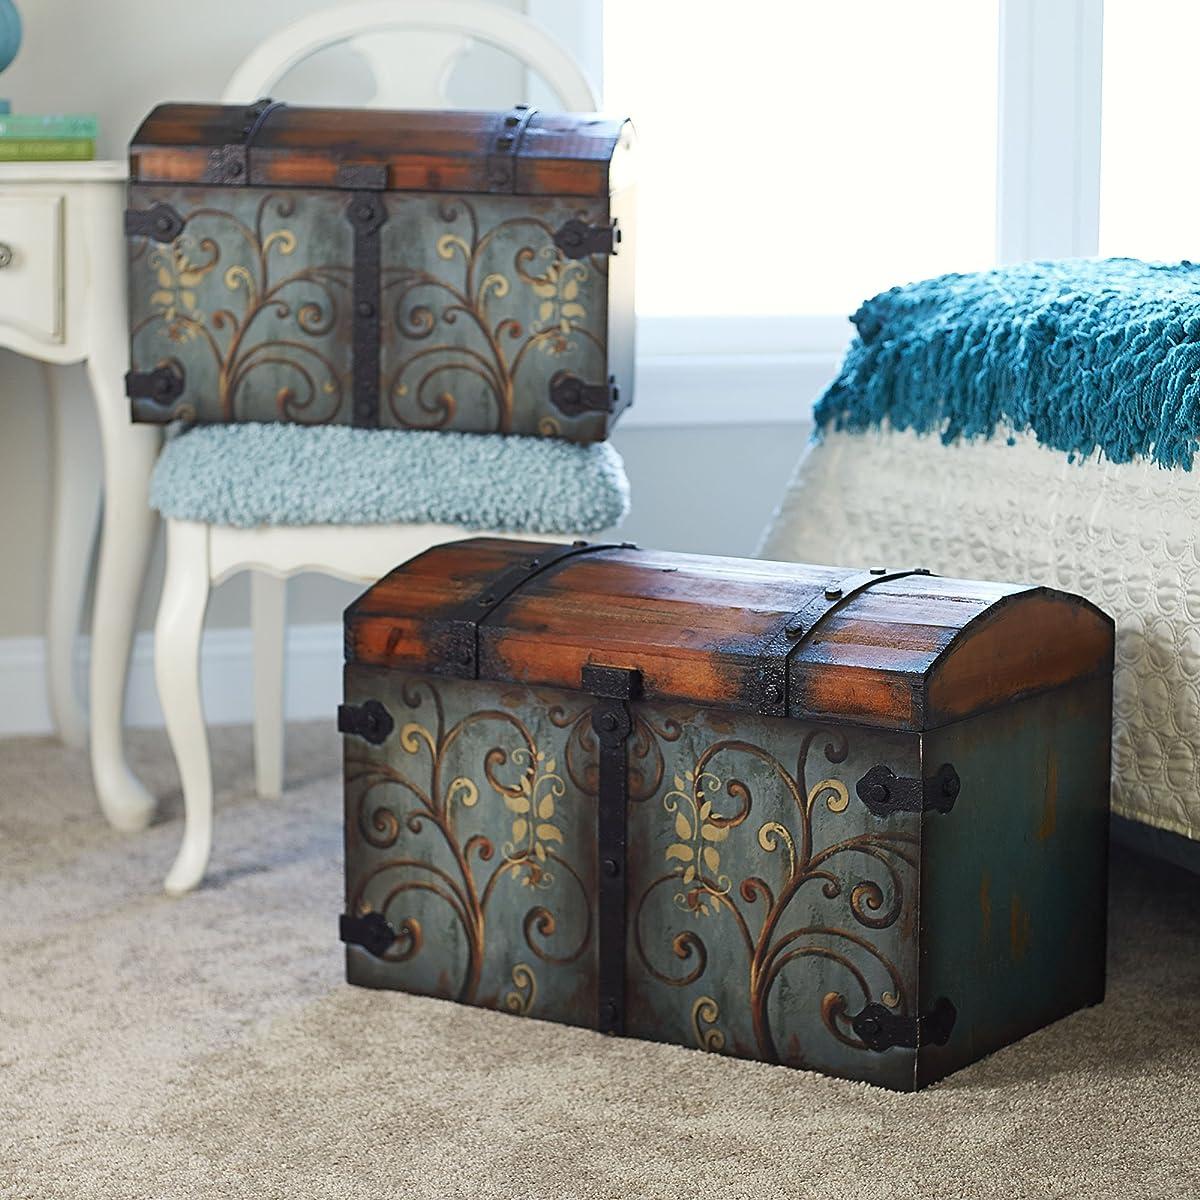 Household Essentials 9502-1 Vintage Wood Storage Trunk, Large, Blue Body/Brown Lid/Floral Design